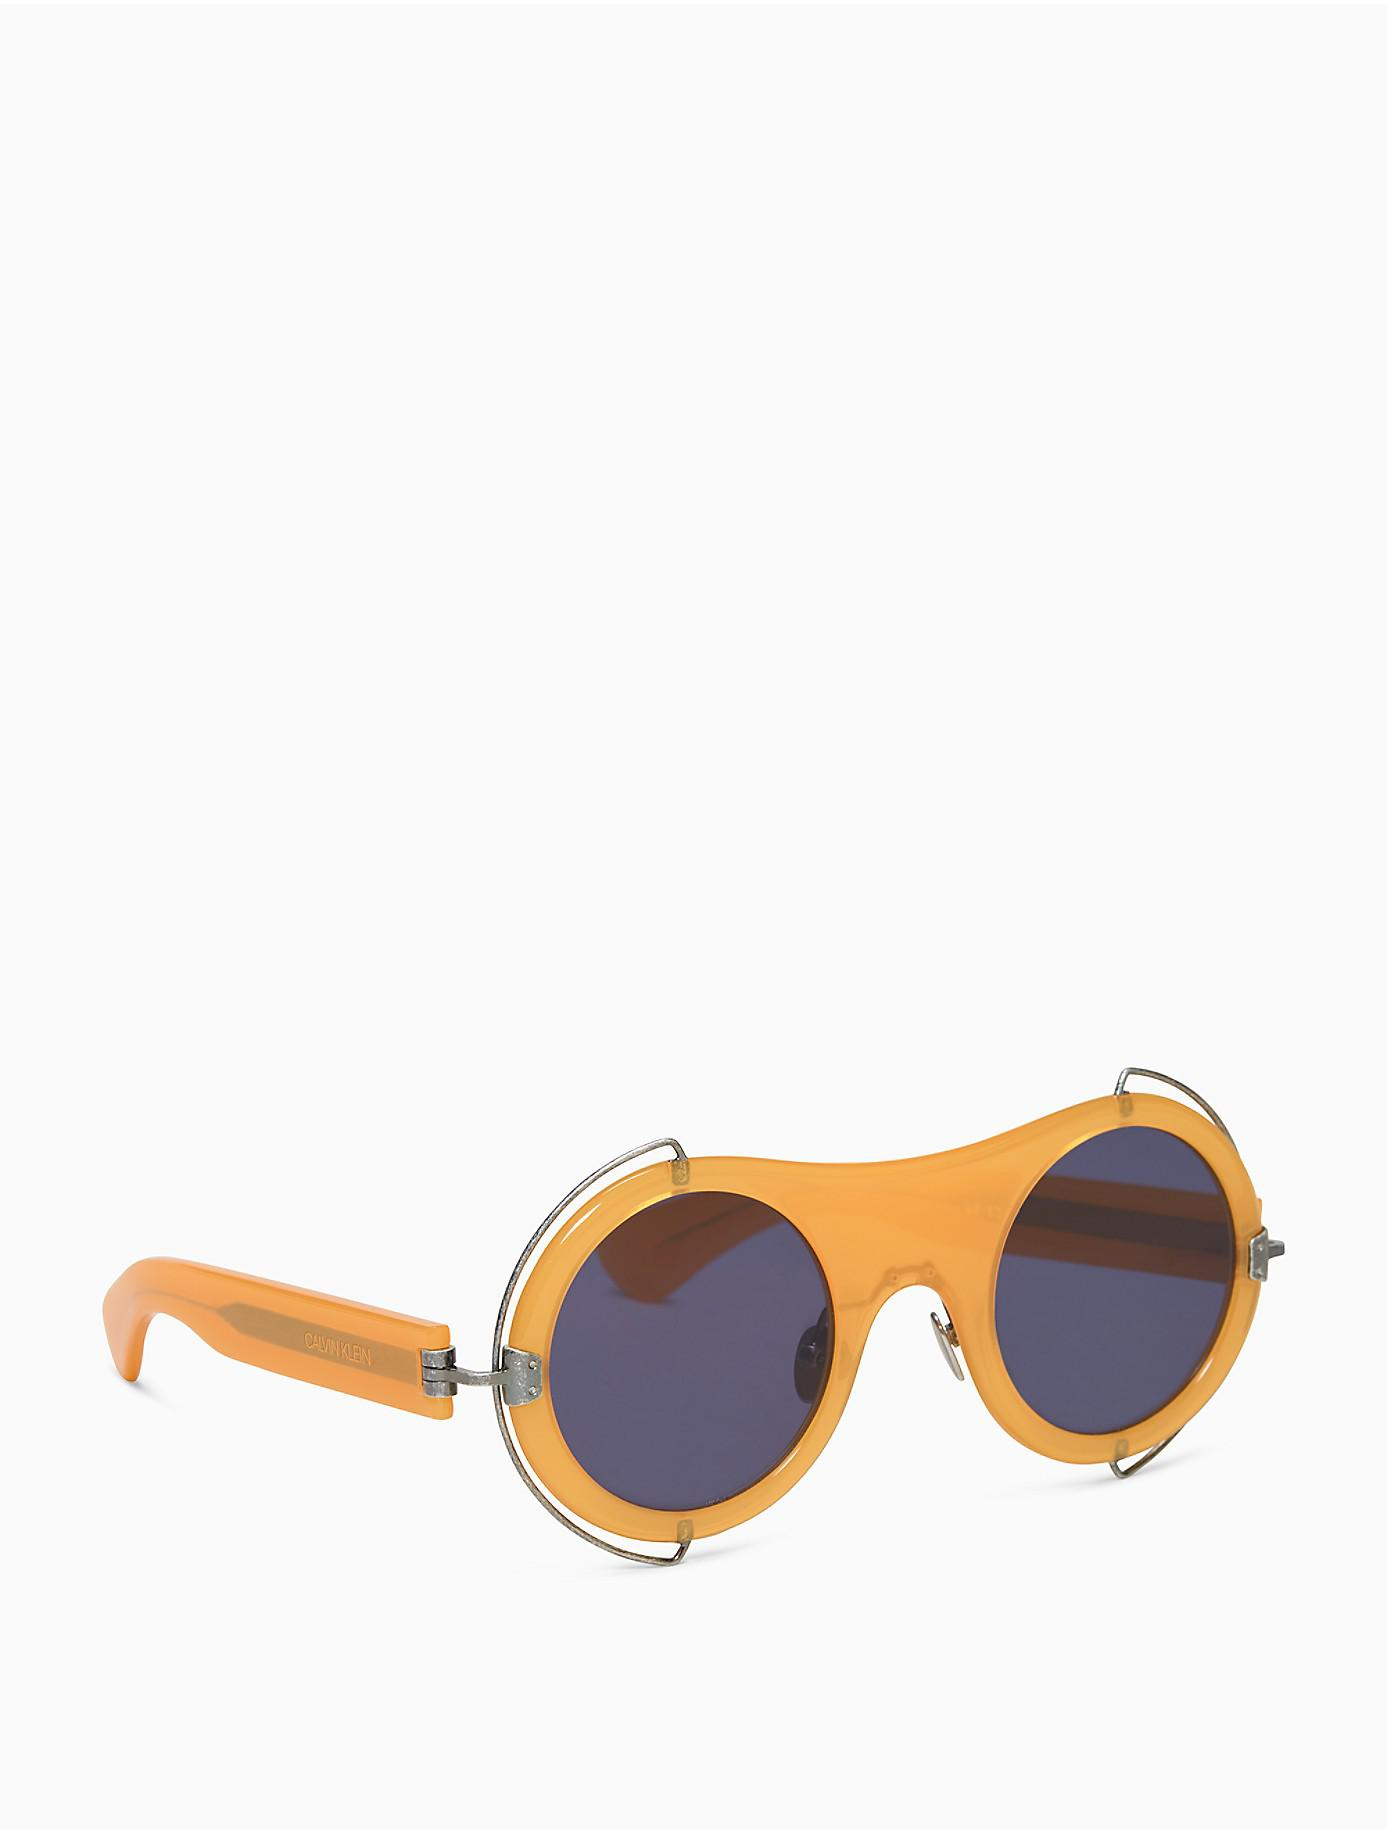 round sunglasses - Yellow & Orange CALVIN KLEIN 205W39NYC 1q6uaW2ND7